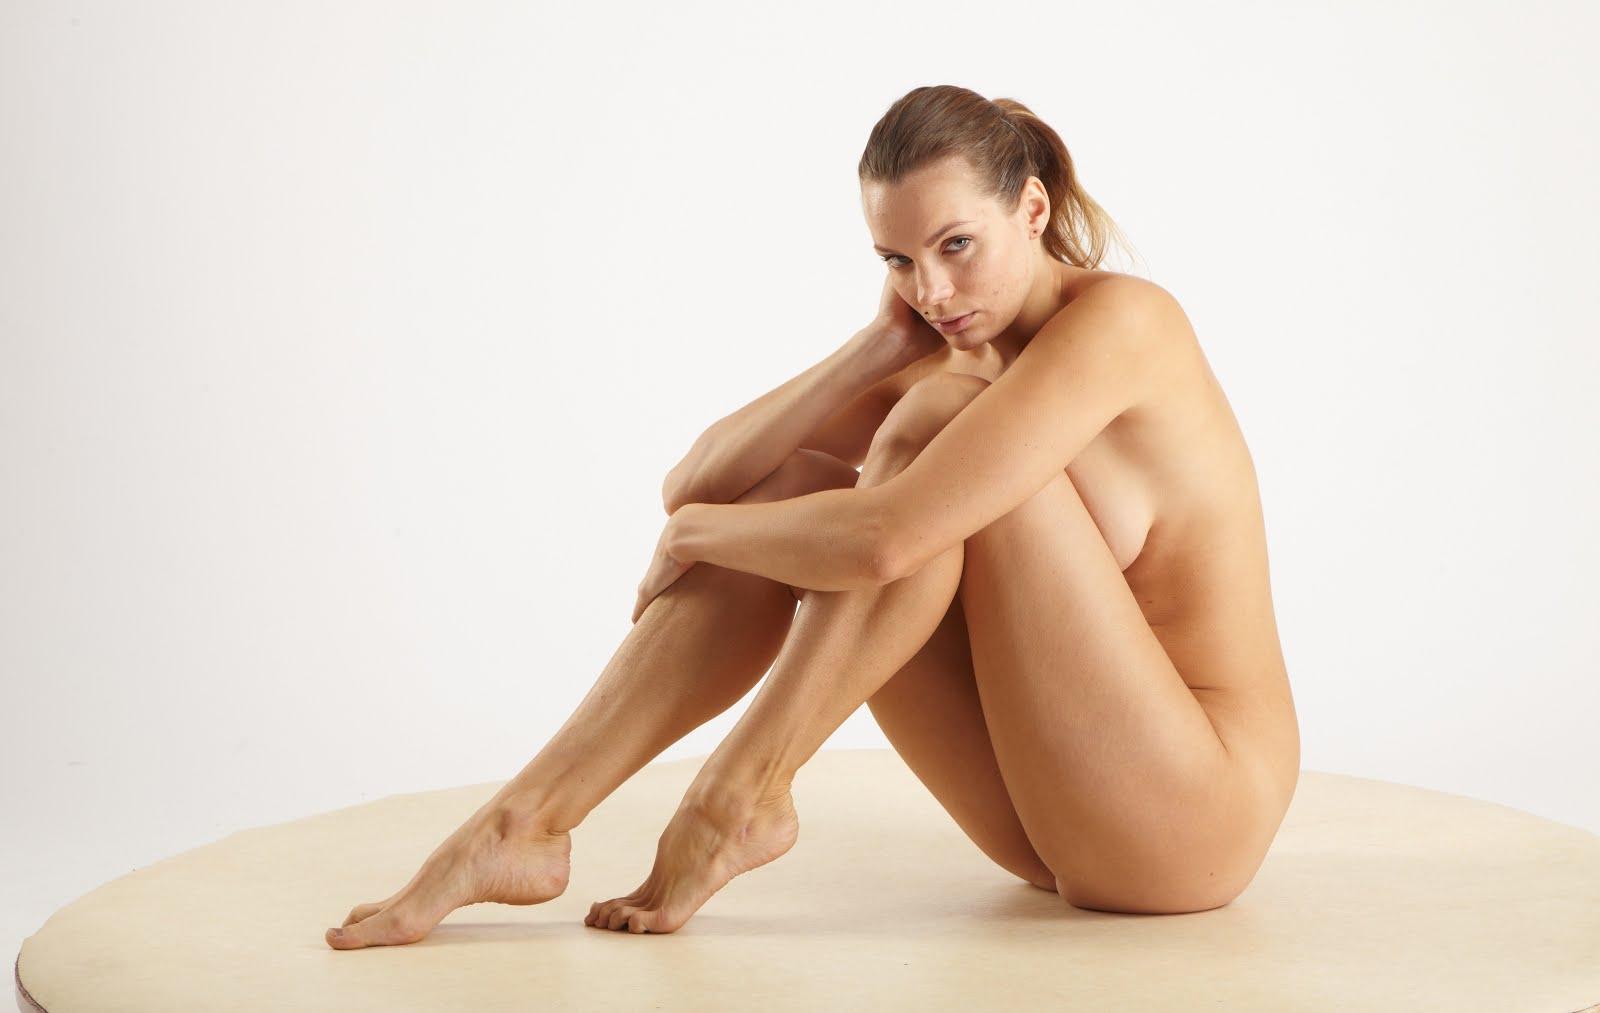 nude female figure study models